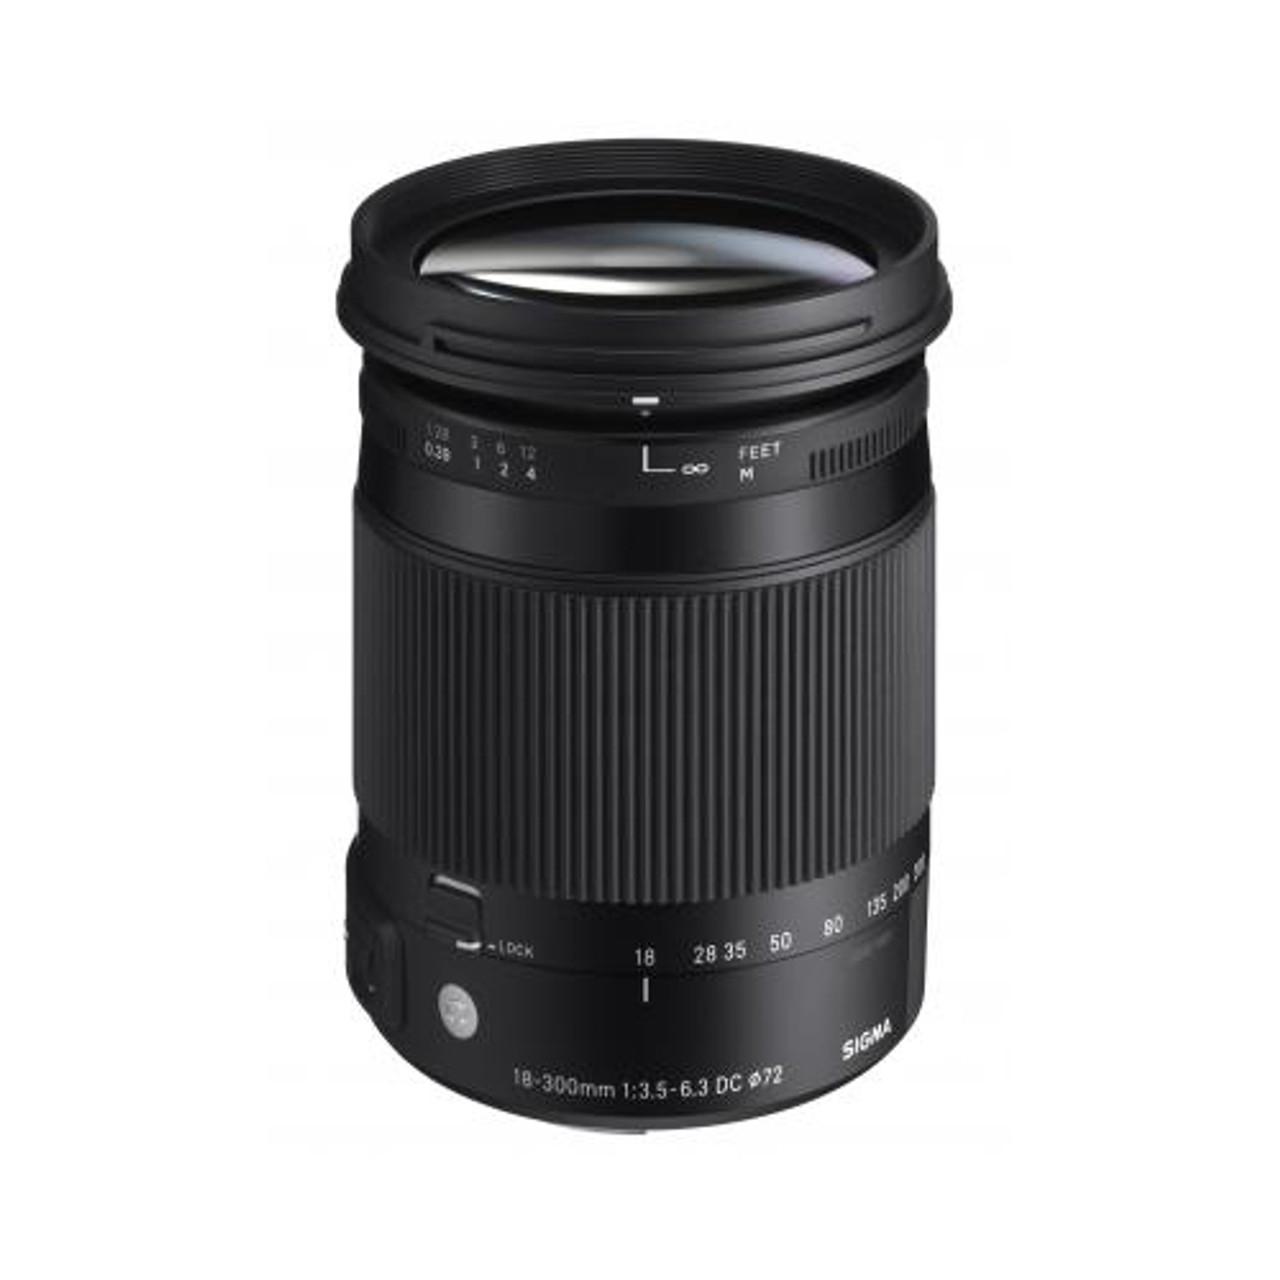 Sigma 18-300mm F3.5-6.3 C DC Macro OS Canon